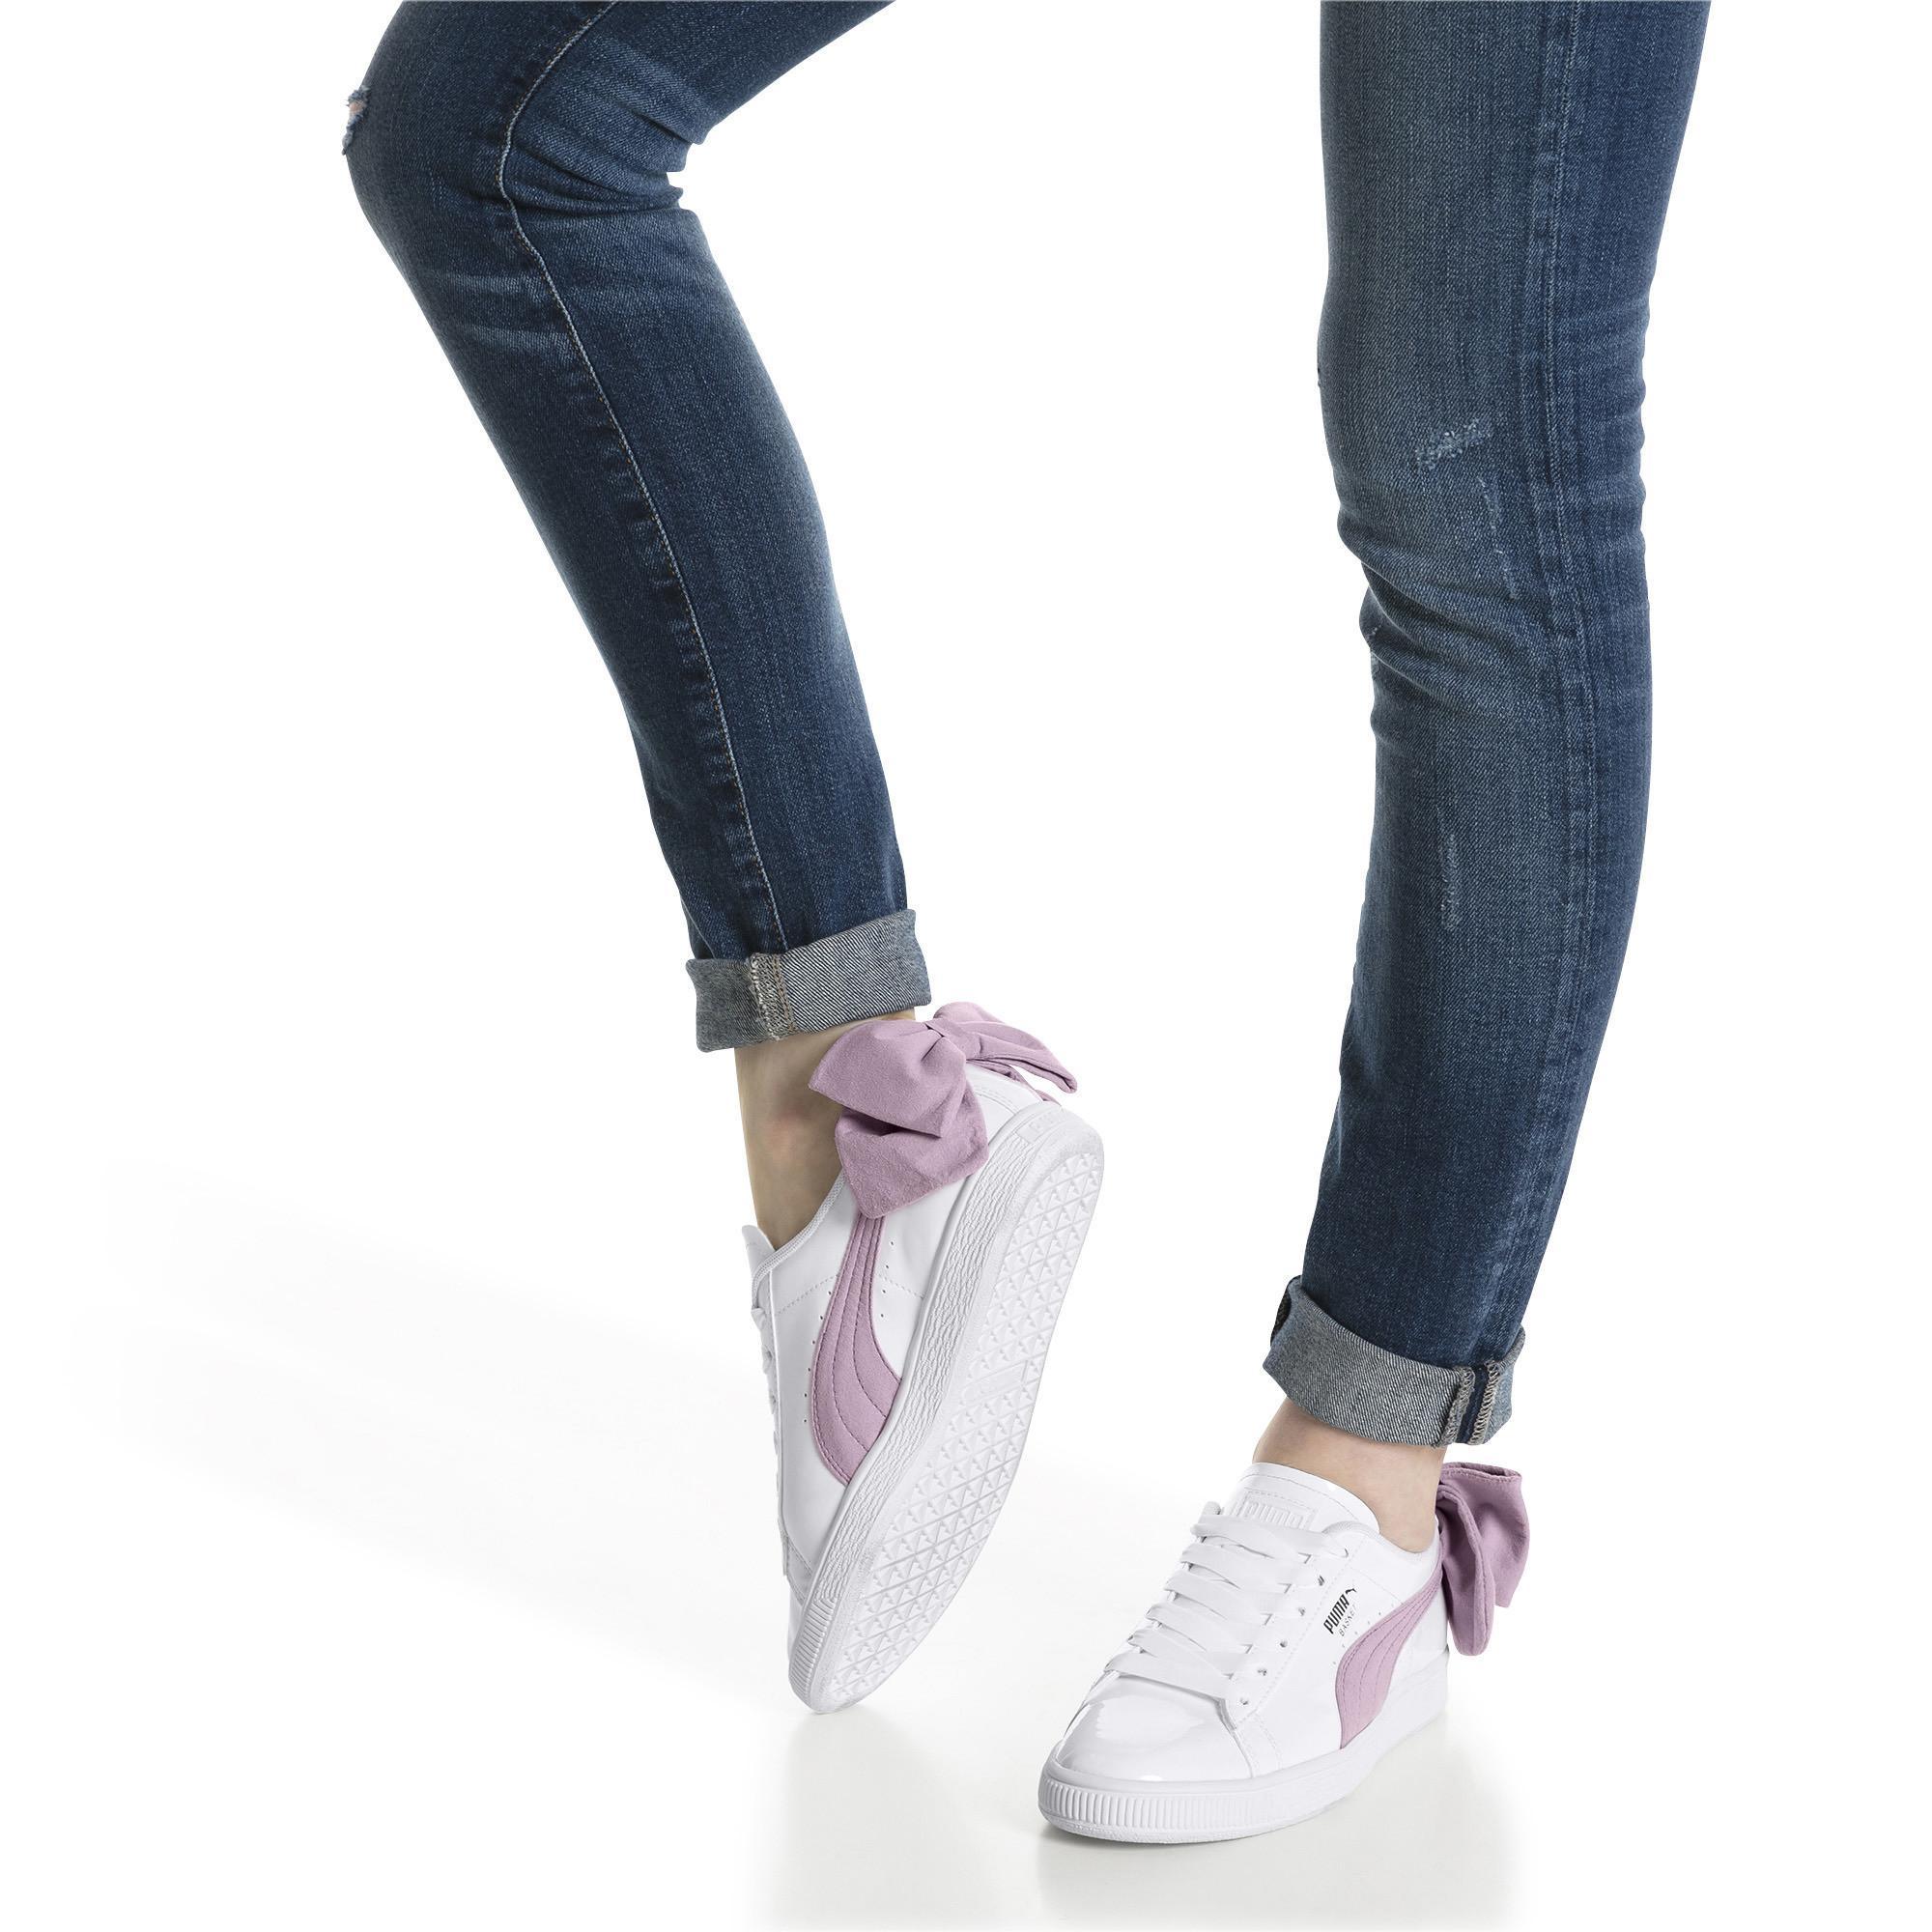 PUMA Basket Suede Bow Women's Sneakers